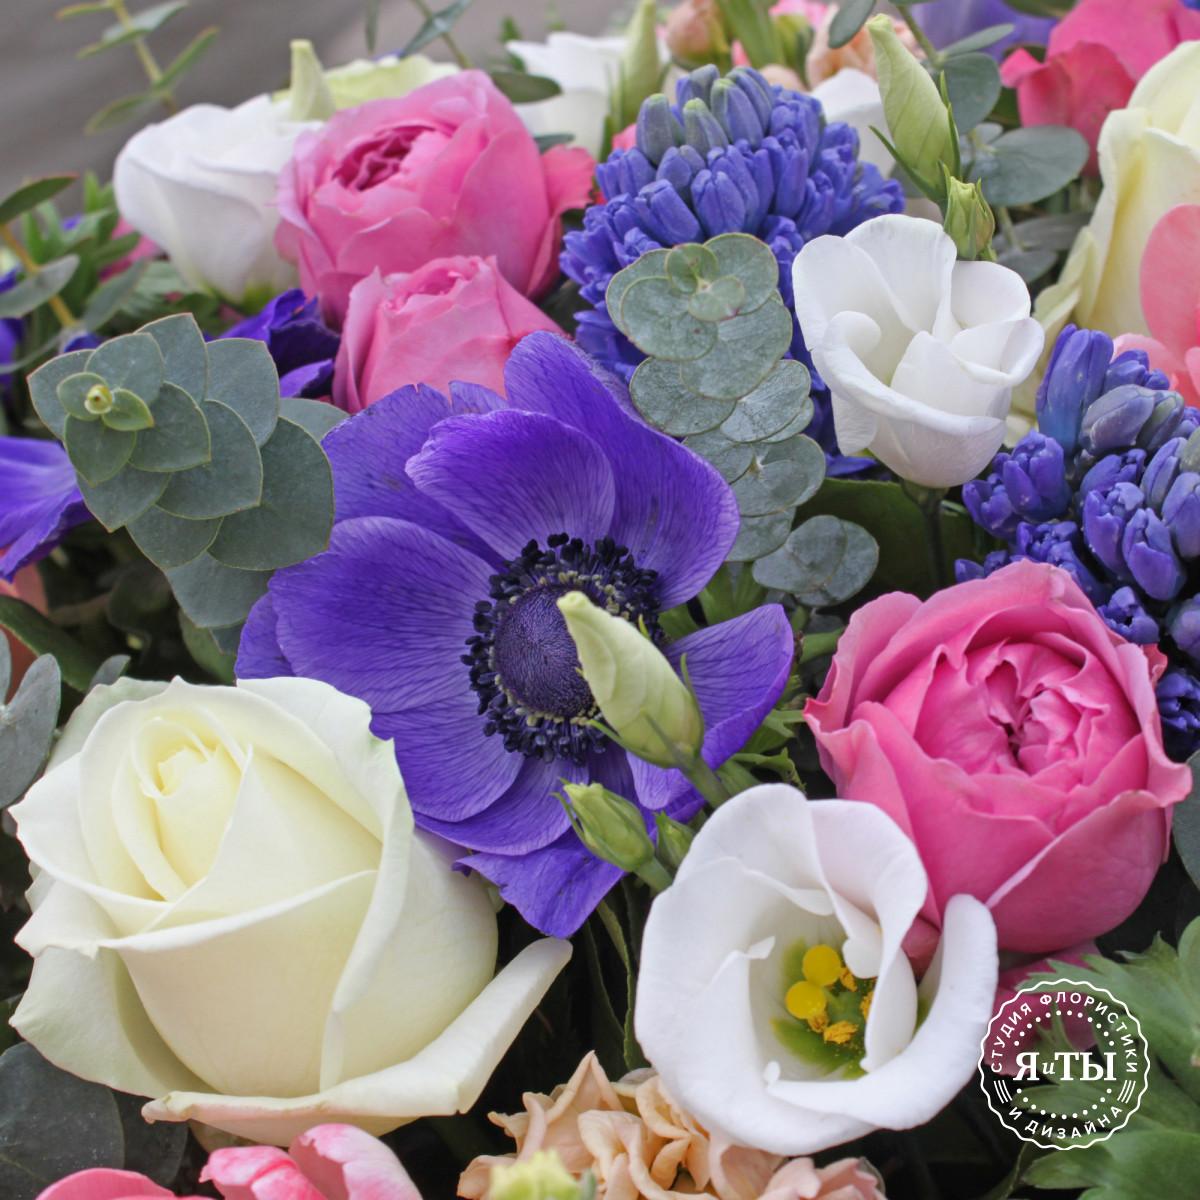 Весенняя корзина с гиацинтами и тюльпанами